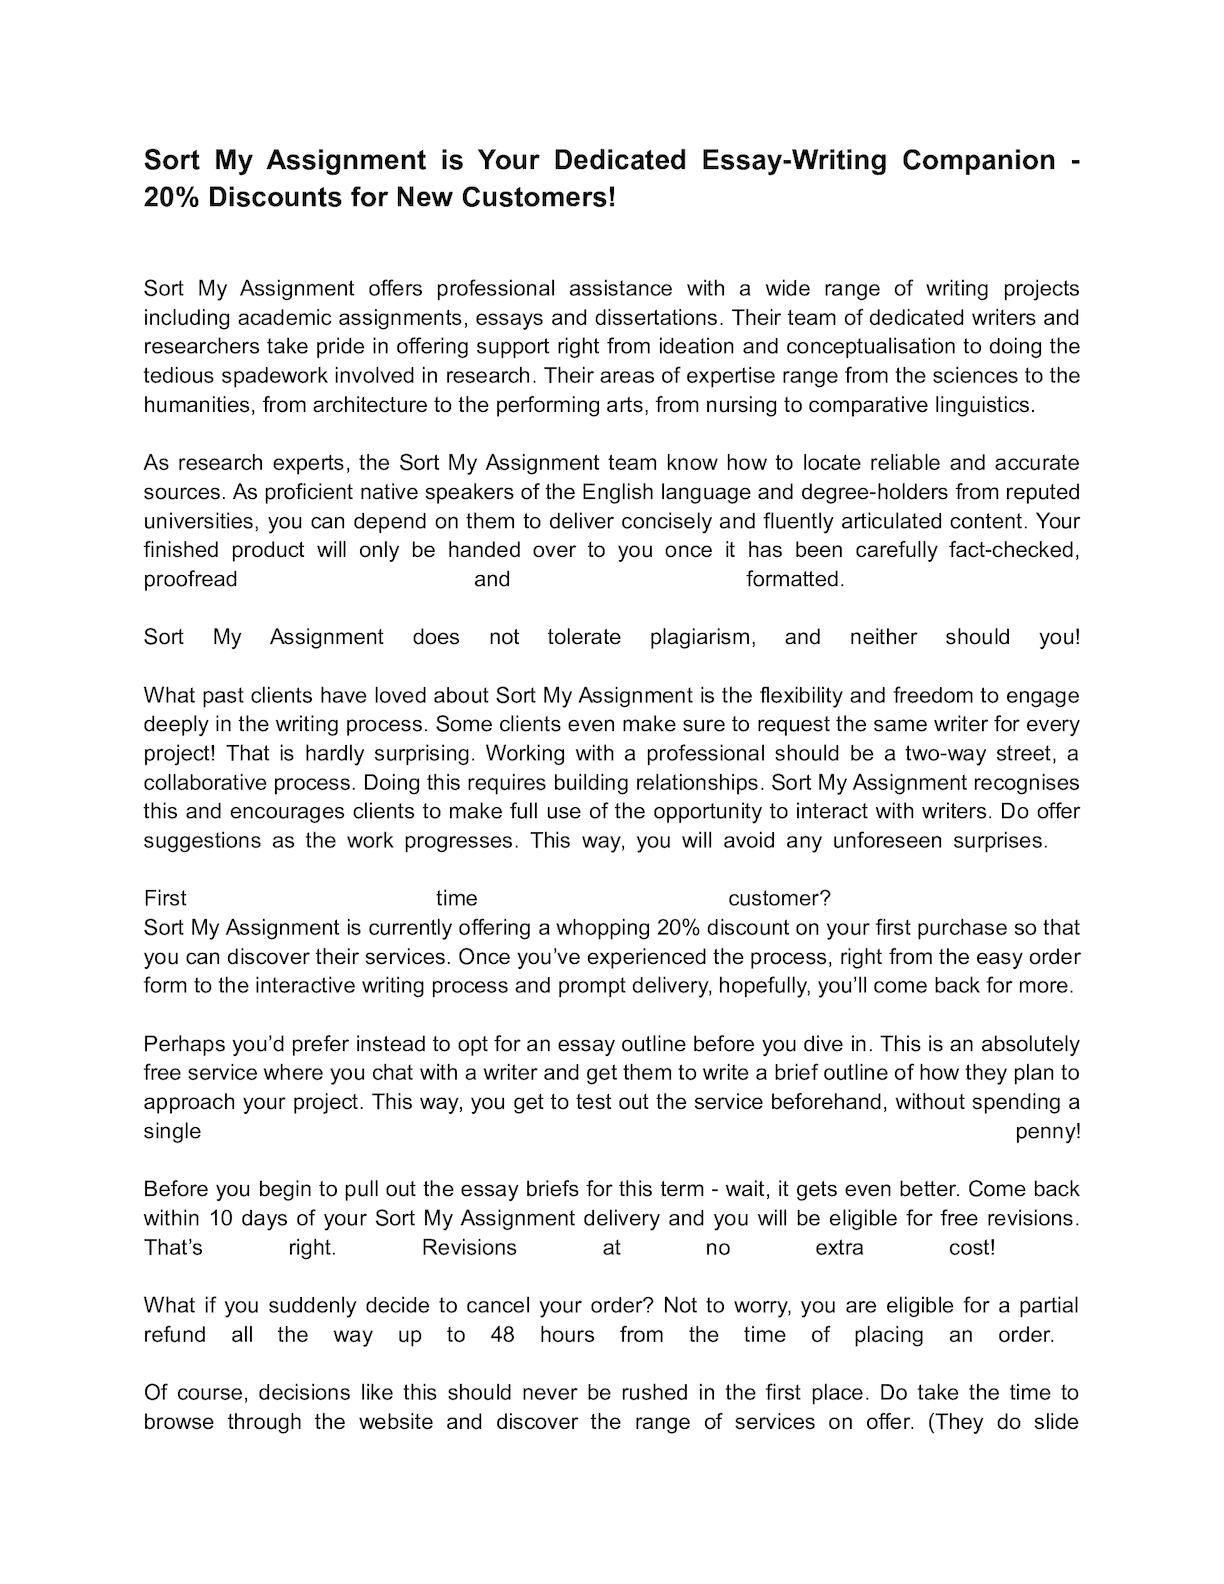 essay about companion